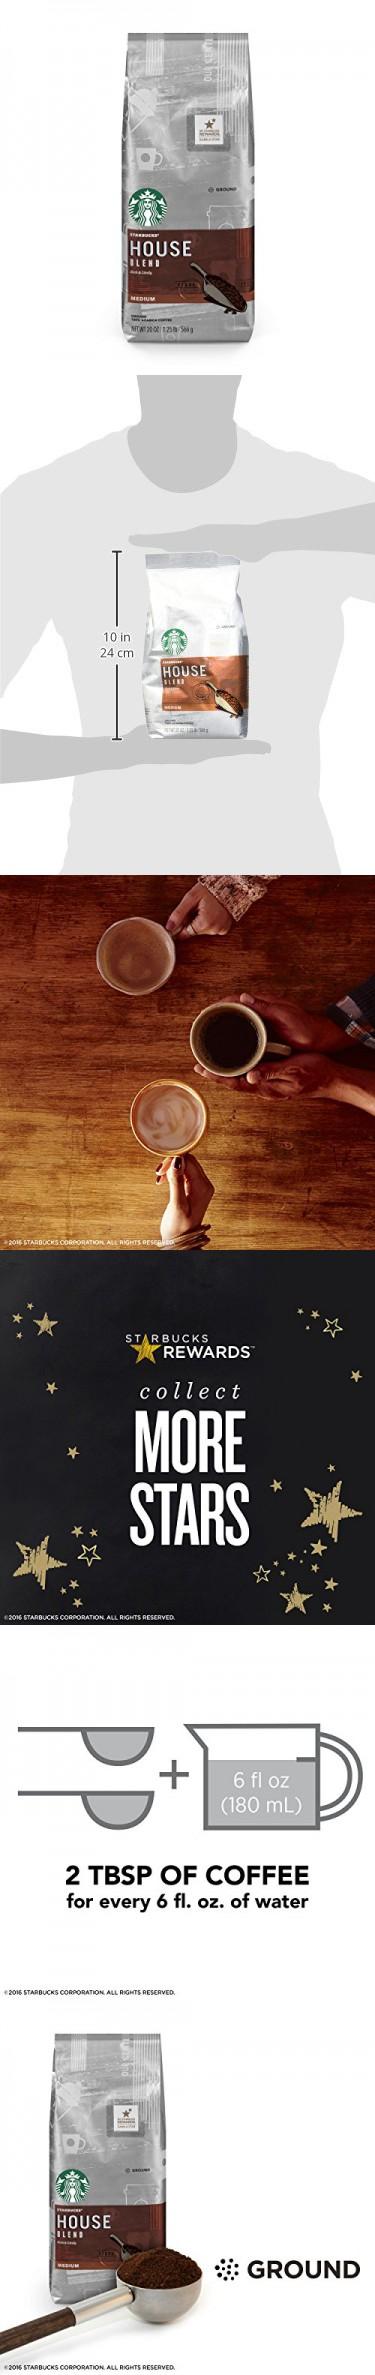 Starbucks House Blend Medium Roast Ground Coffee, 20Ounce